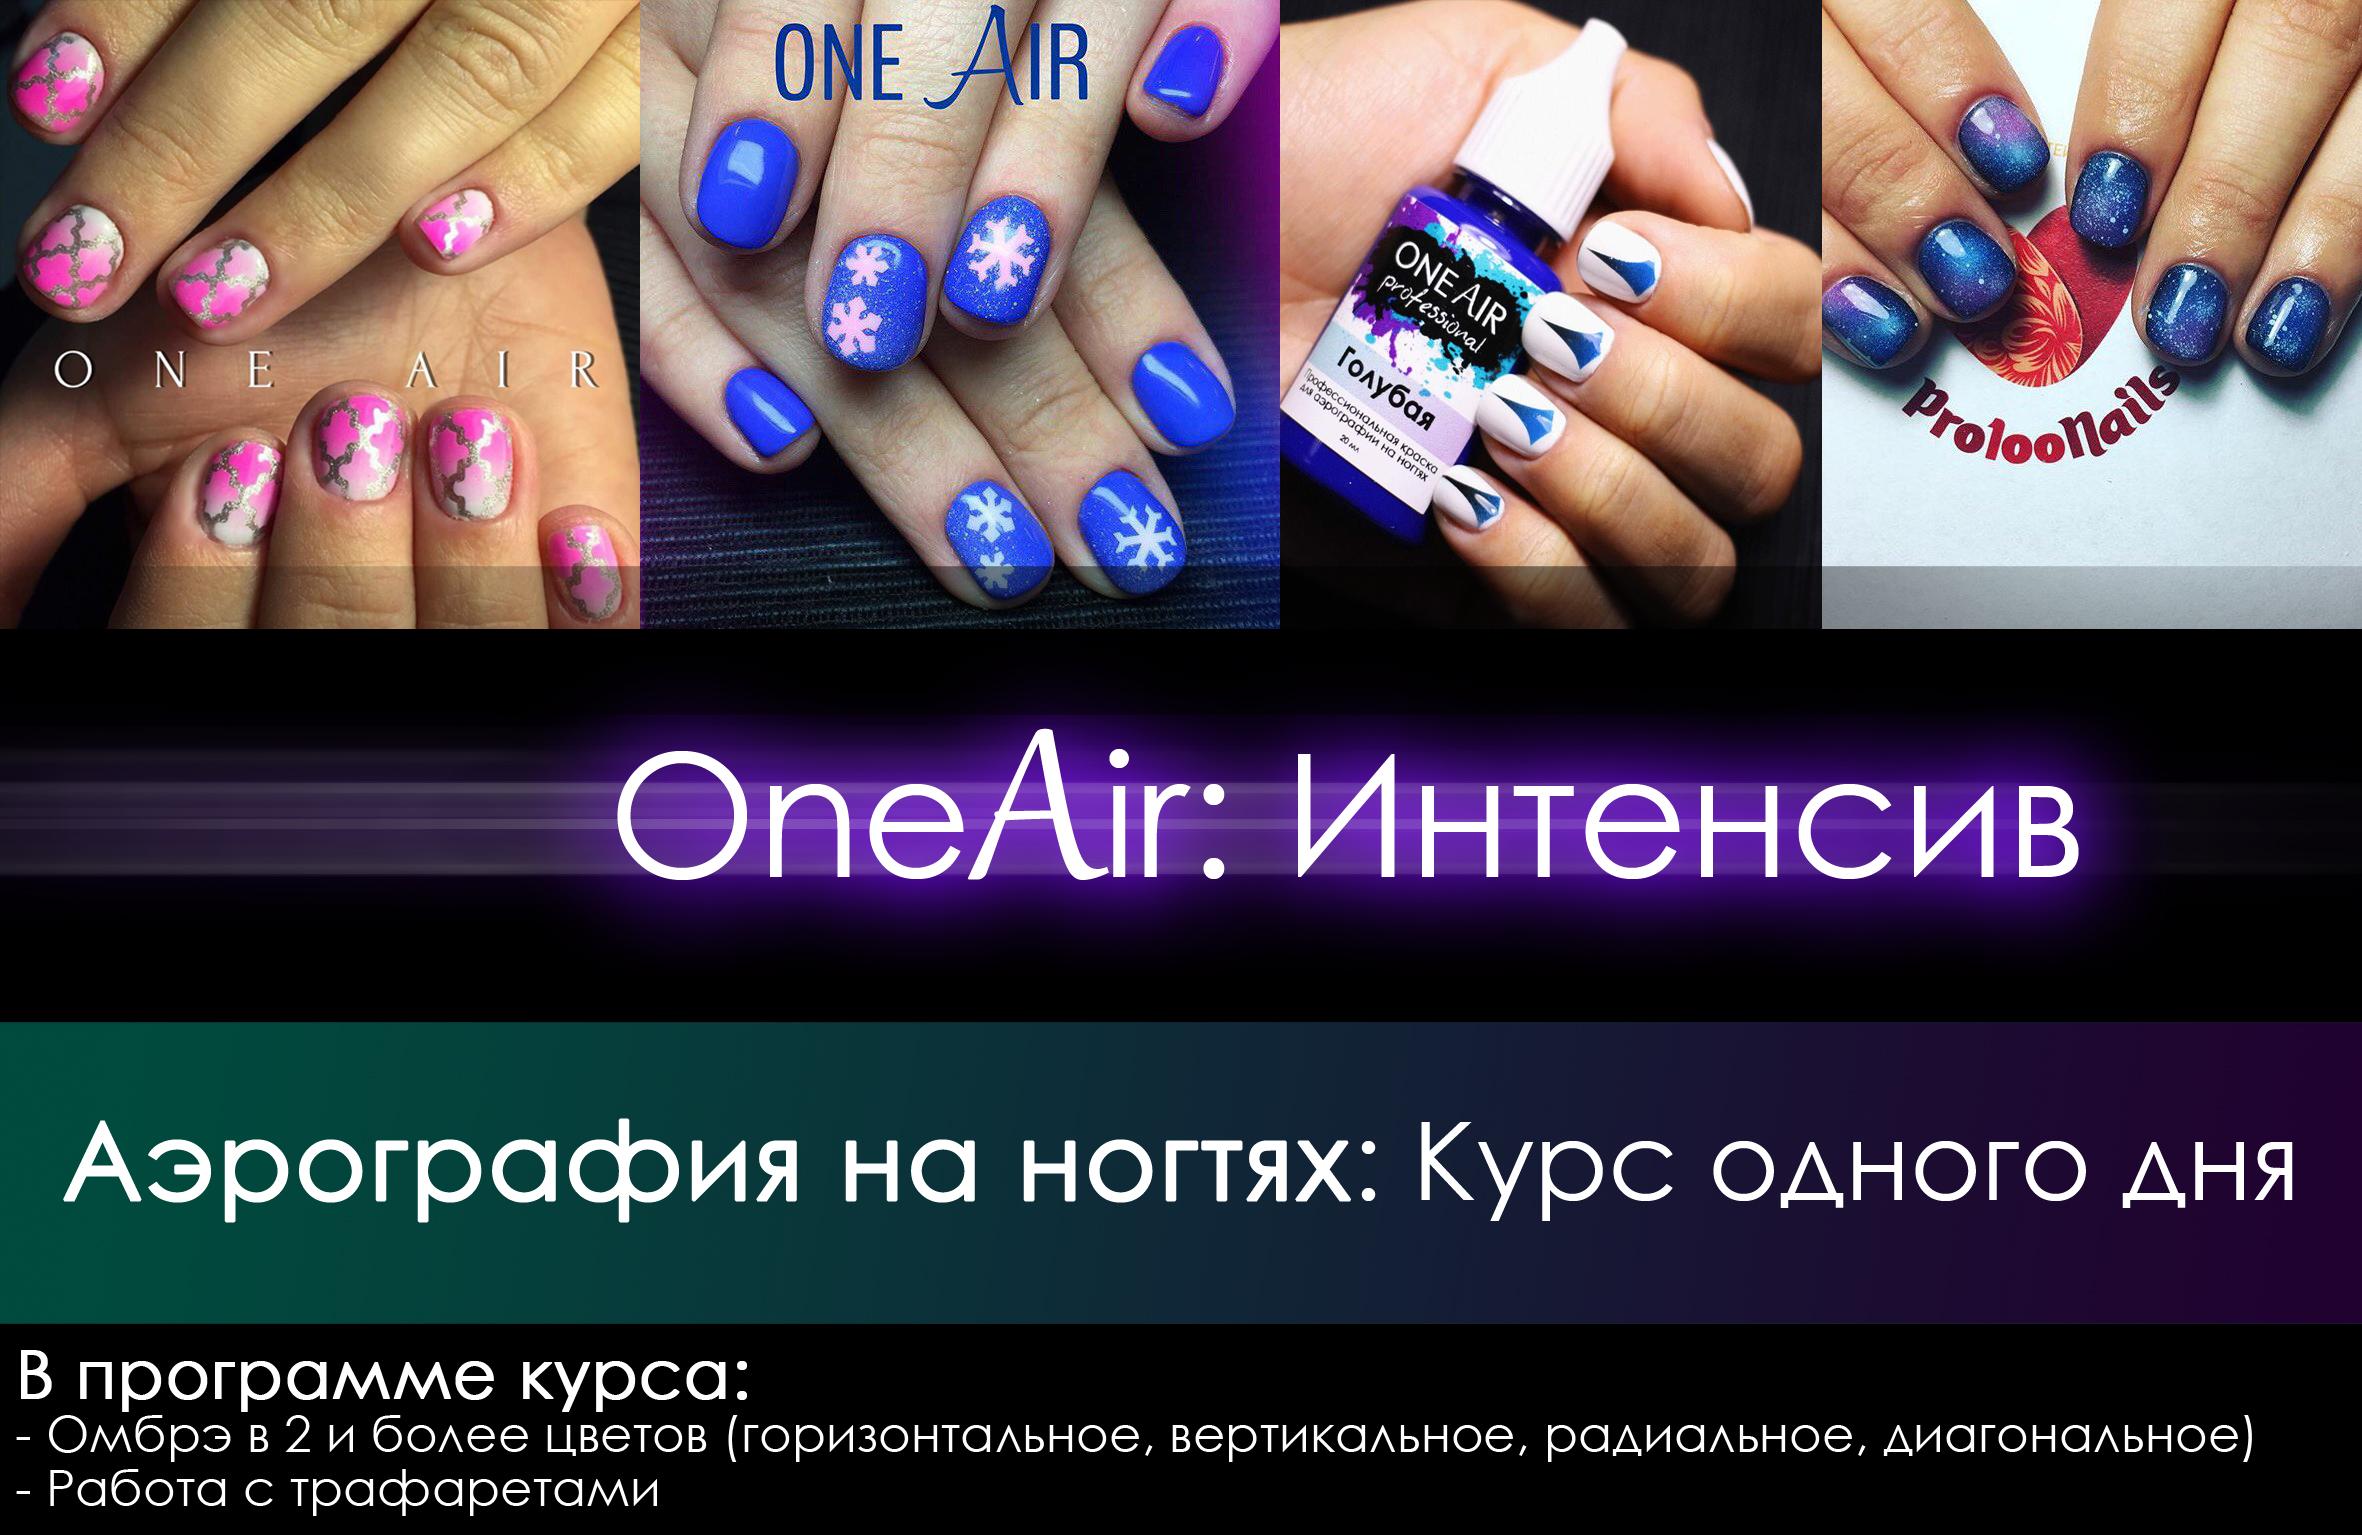 курсы аэрографии на ногтях oneair, курсы аэрографии на ногтях one air, обучение аэрографии на ногтях, москва, питер, спб, санкт-петербург